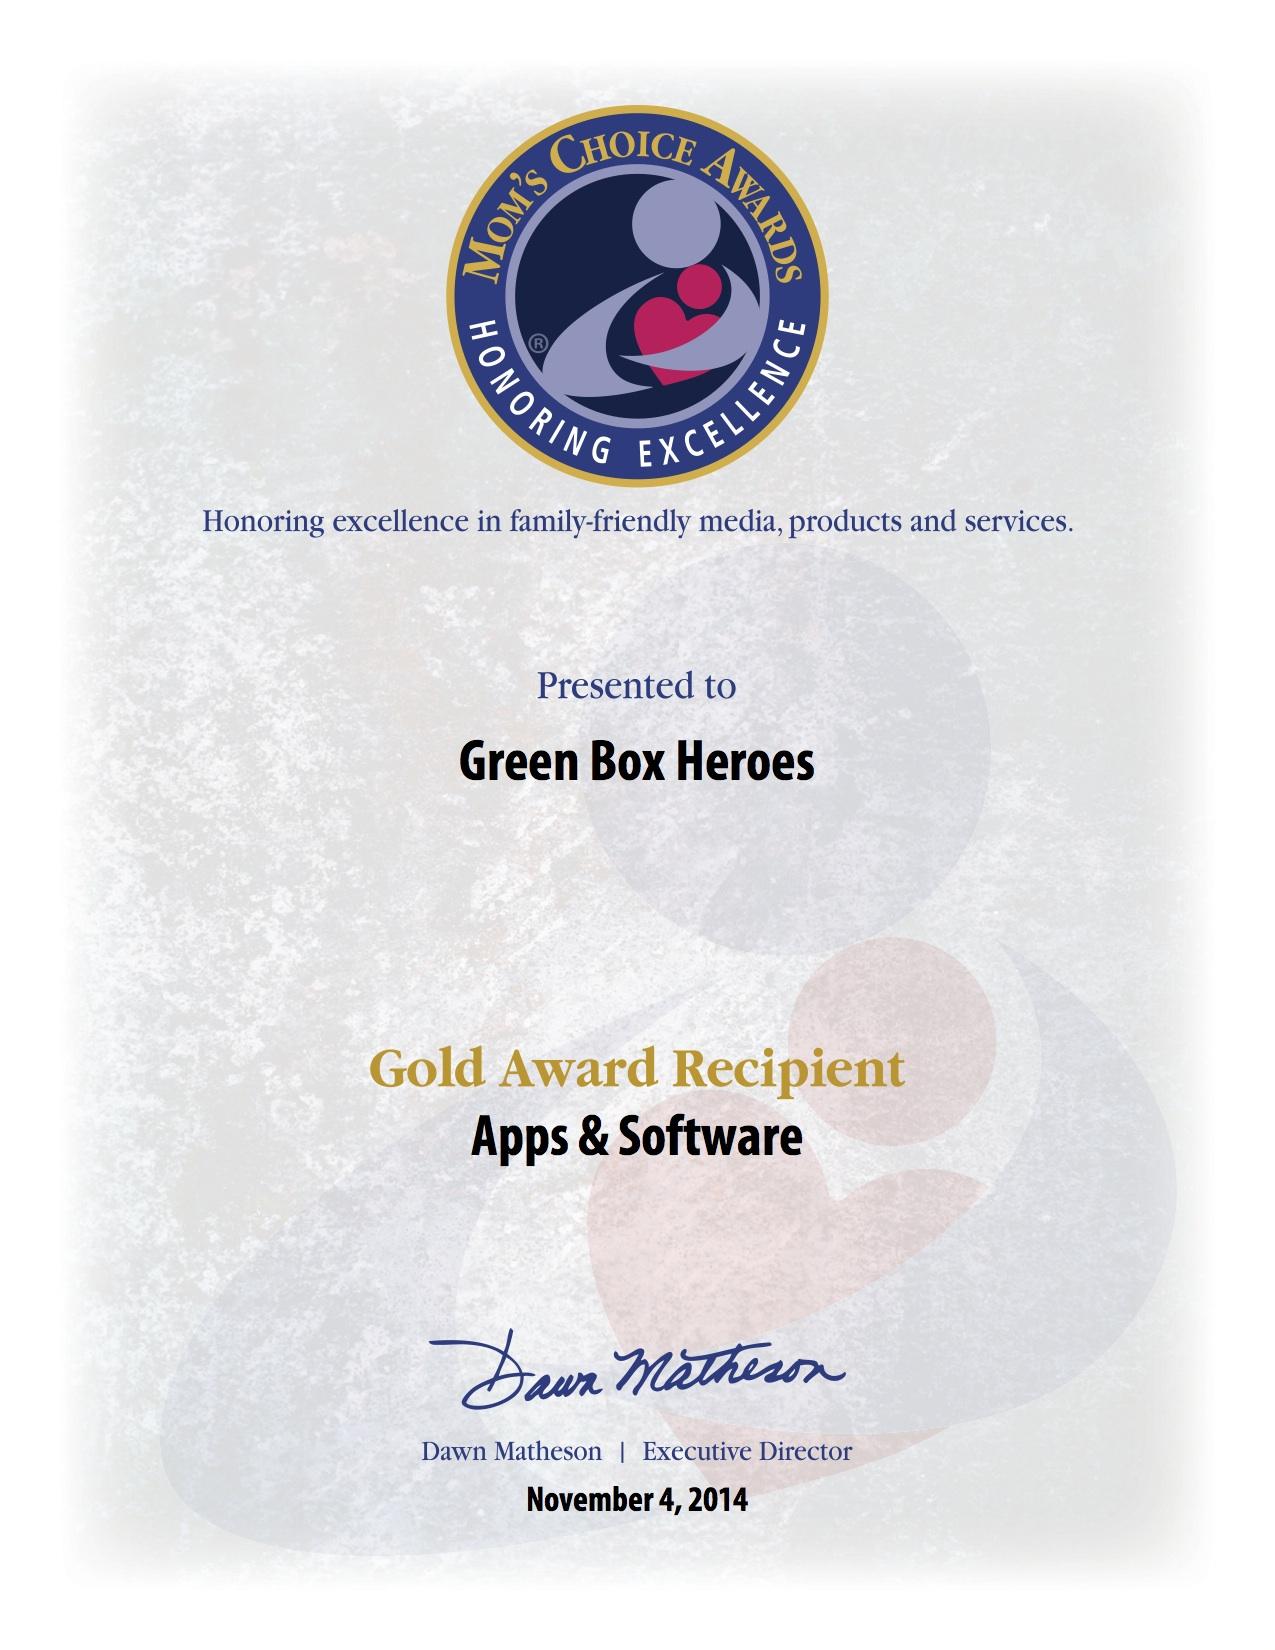 Green Box Heroes